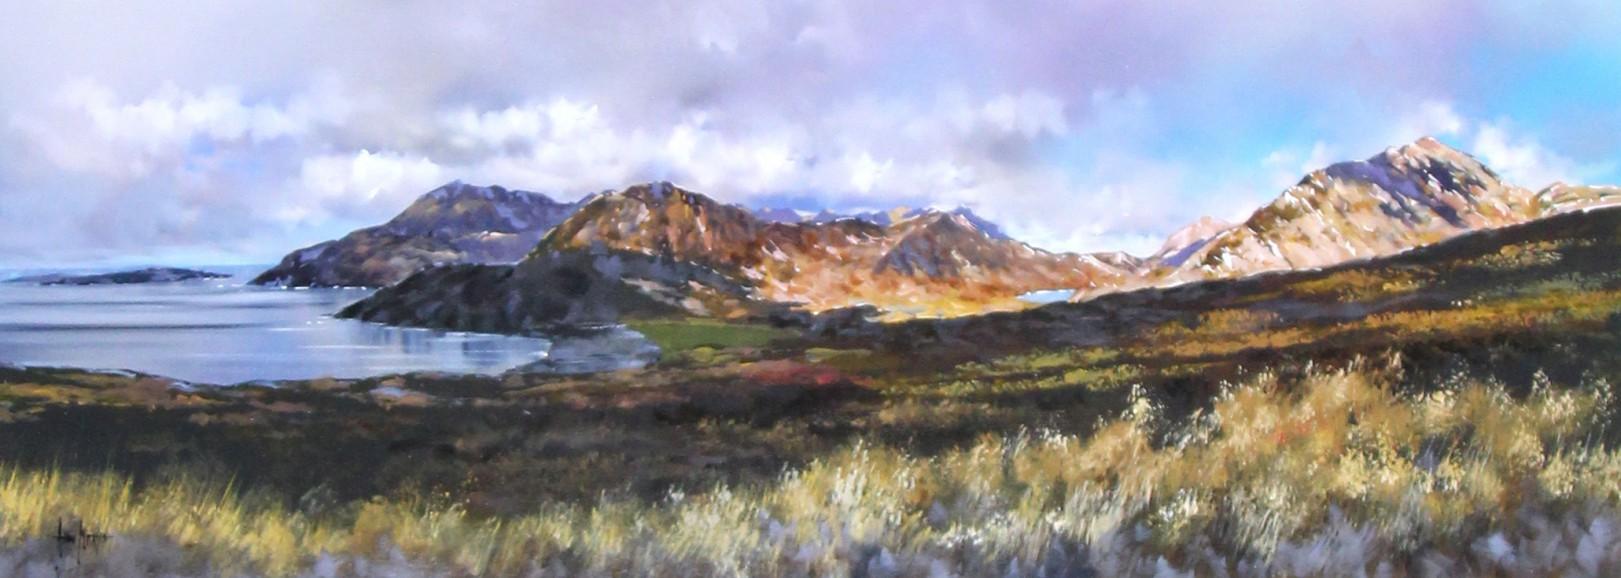 Allan Morgan_The Cuillins, Isle of Skye_Original Oils_15x40